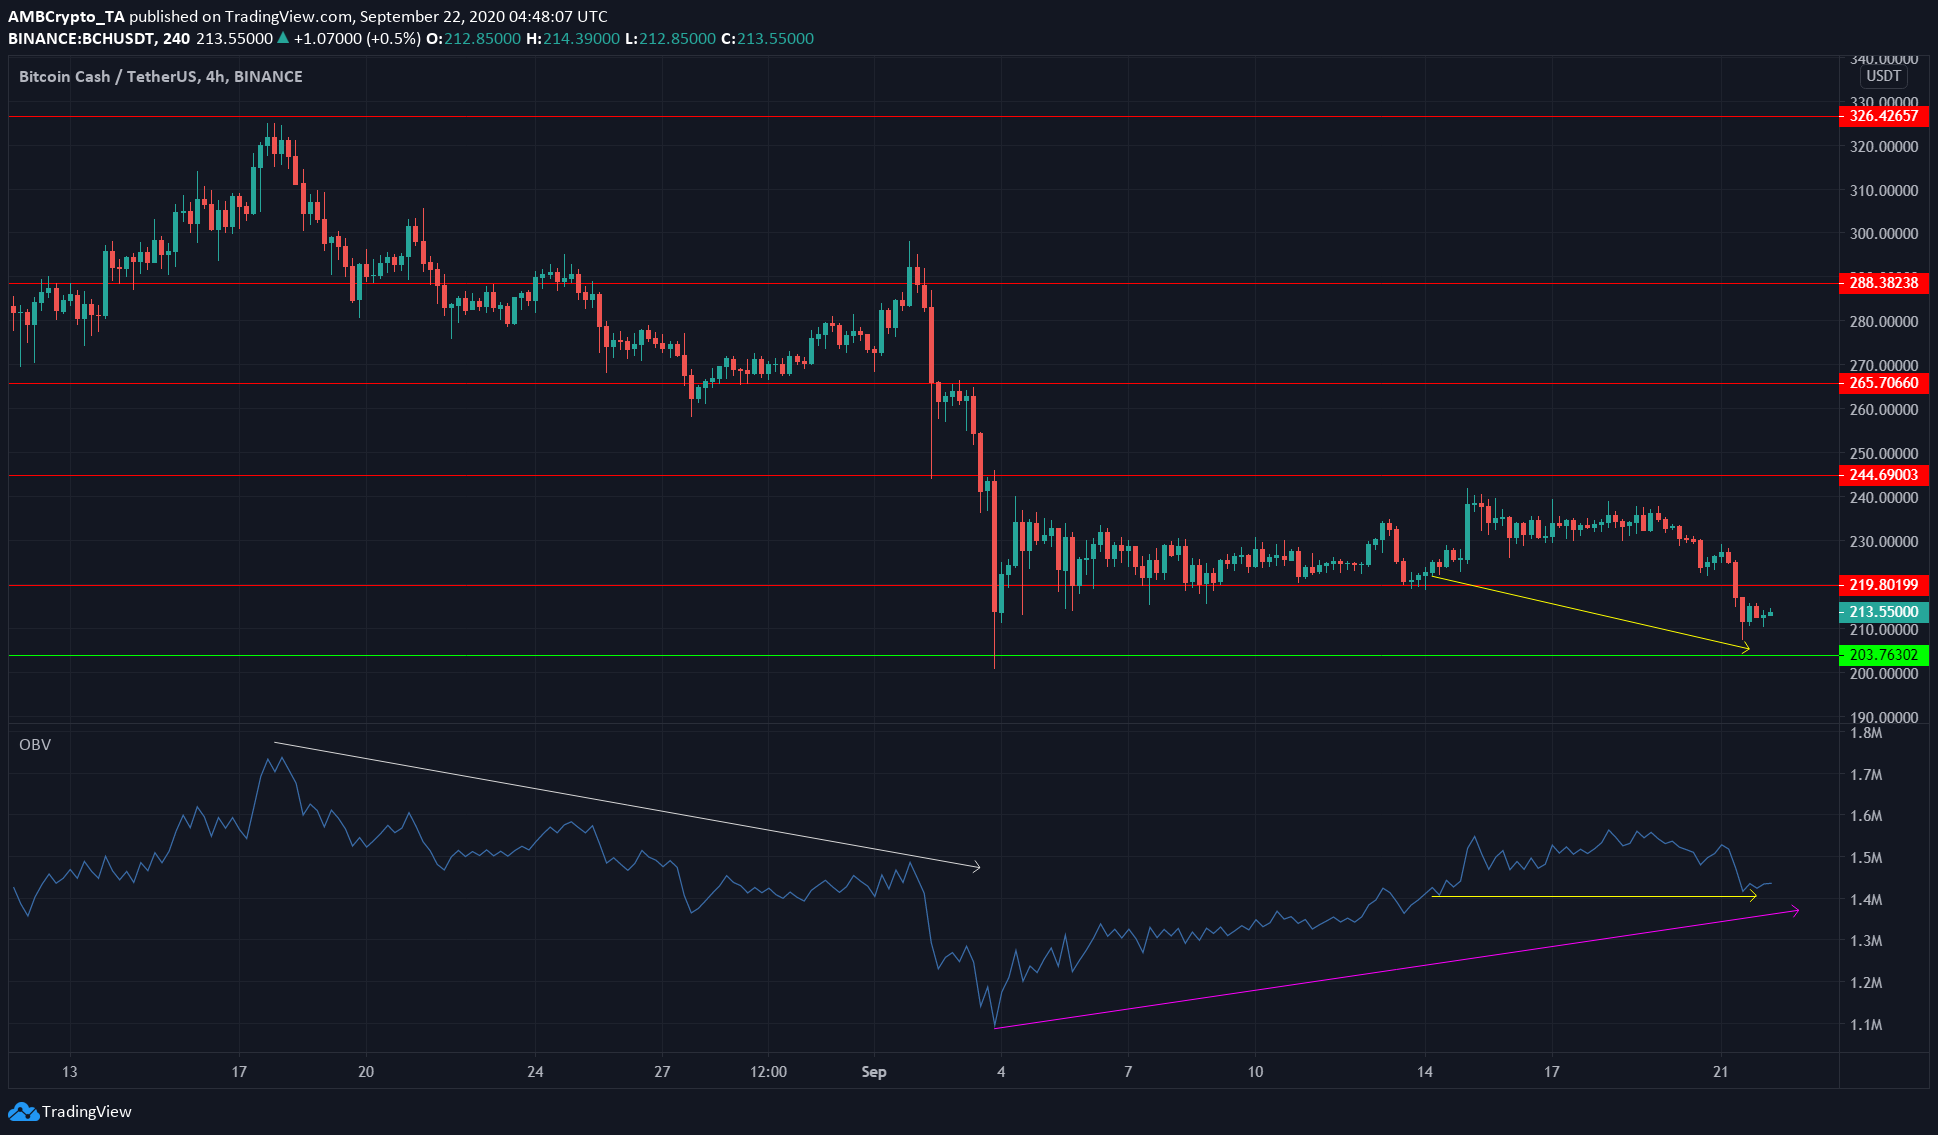 Bitcoin Cash, VeChain, Dogecoin Price Analysis: 22 September